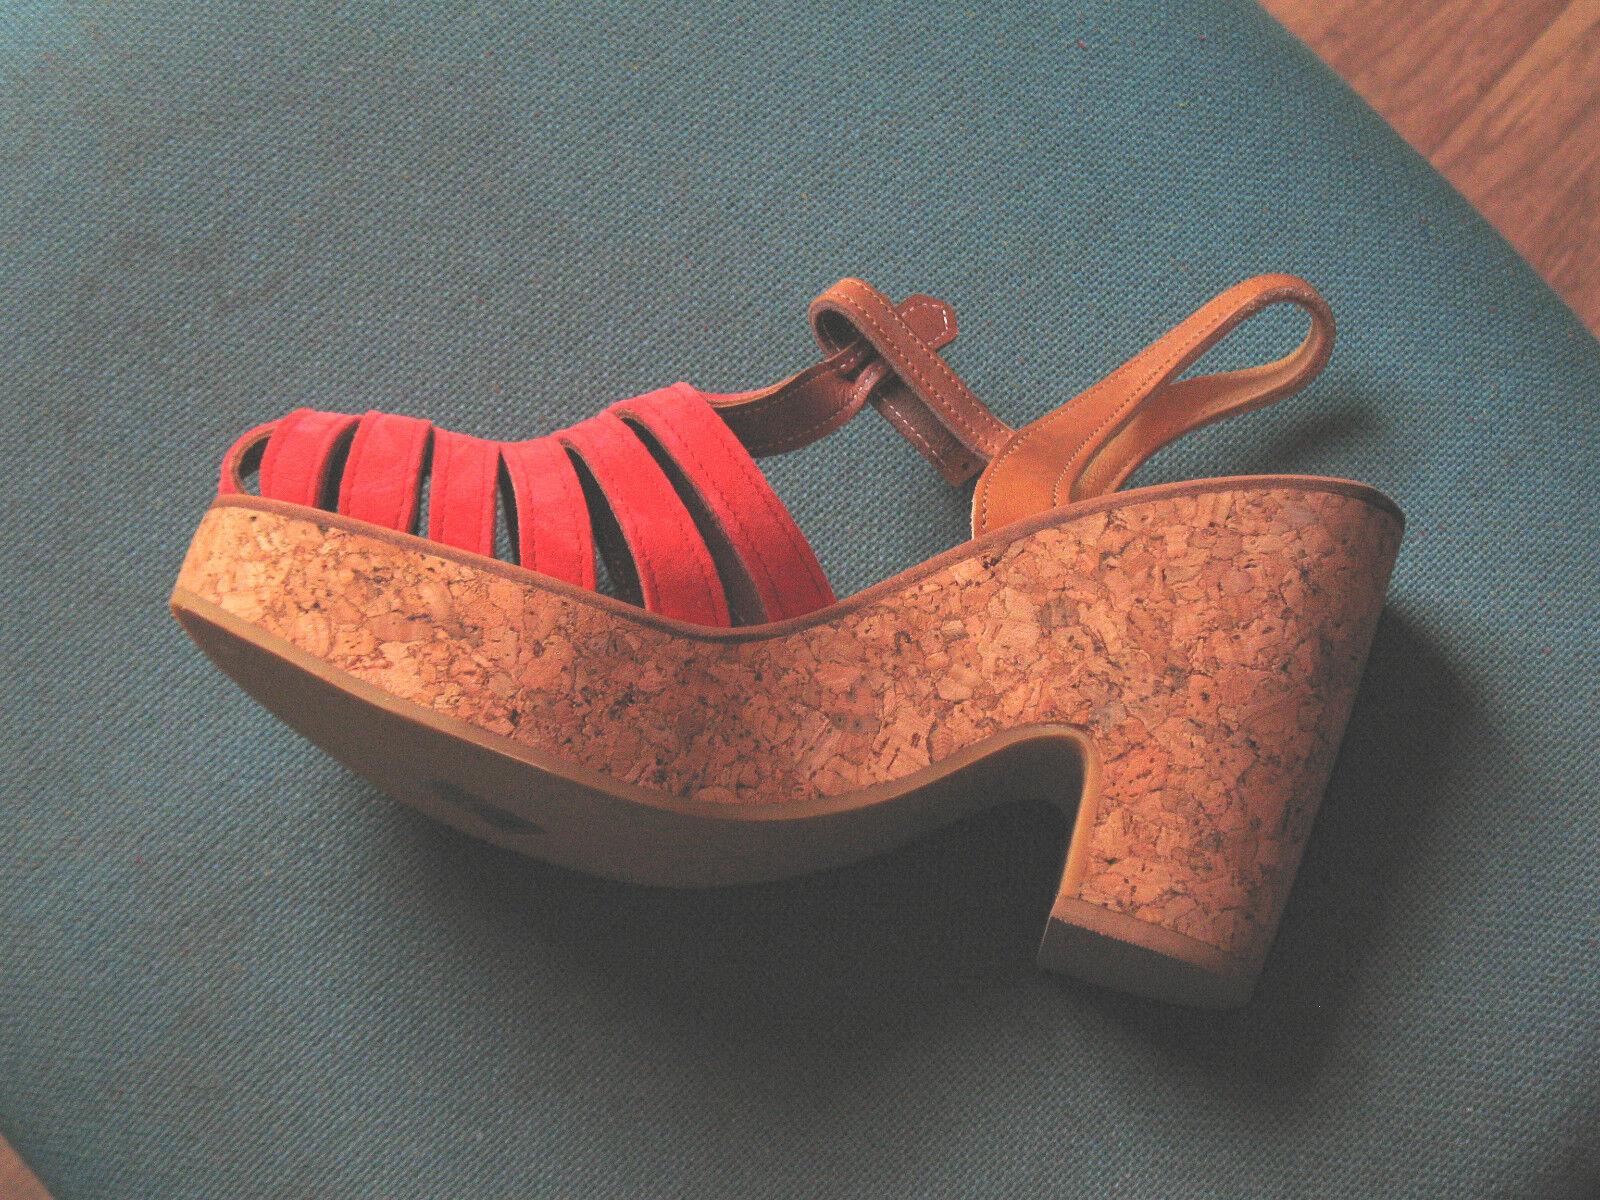 K.Jacques St.Tropez Sandalette Größe 41 neu Sonderangebot  | König der Quantität